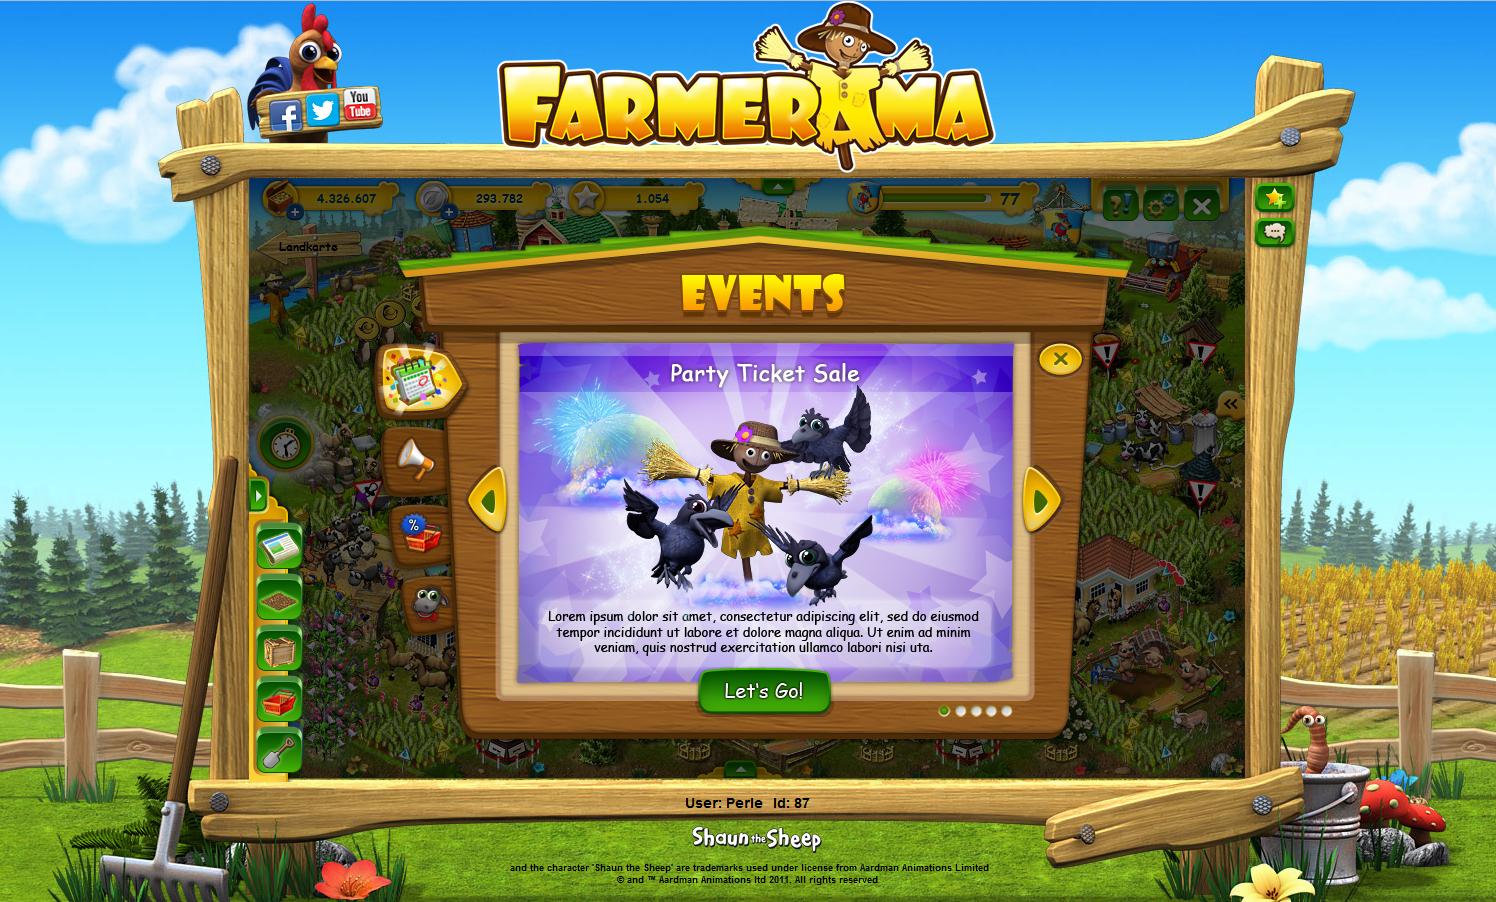 farmwheel2015scaryscarecrow_news_ui.jpg